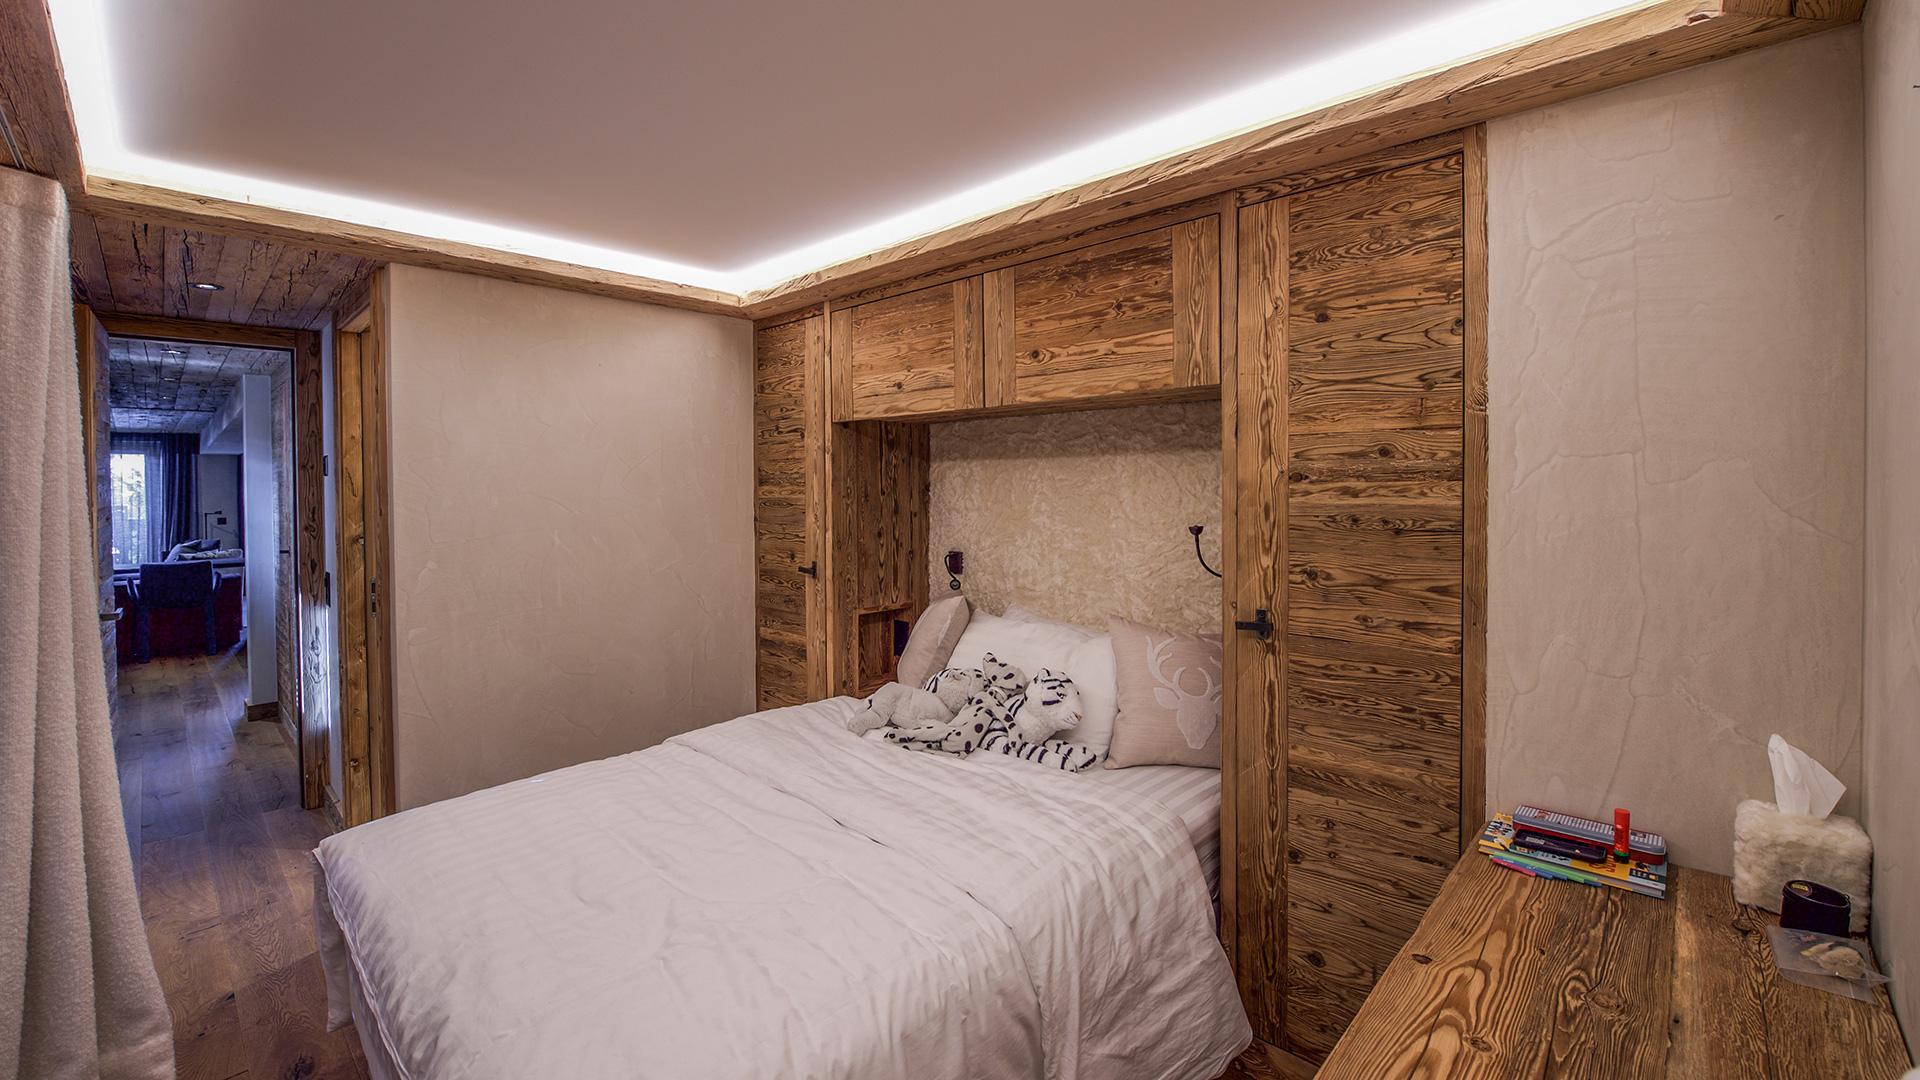 Pleiade 222 Apartments, Switzerland